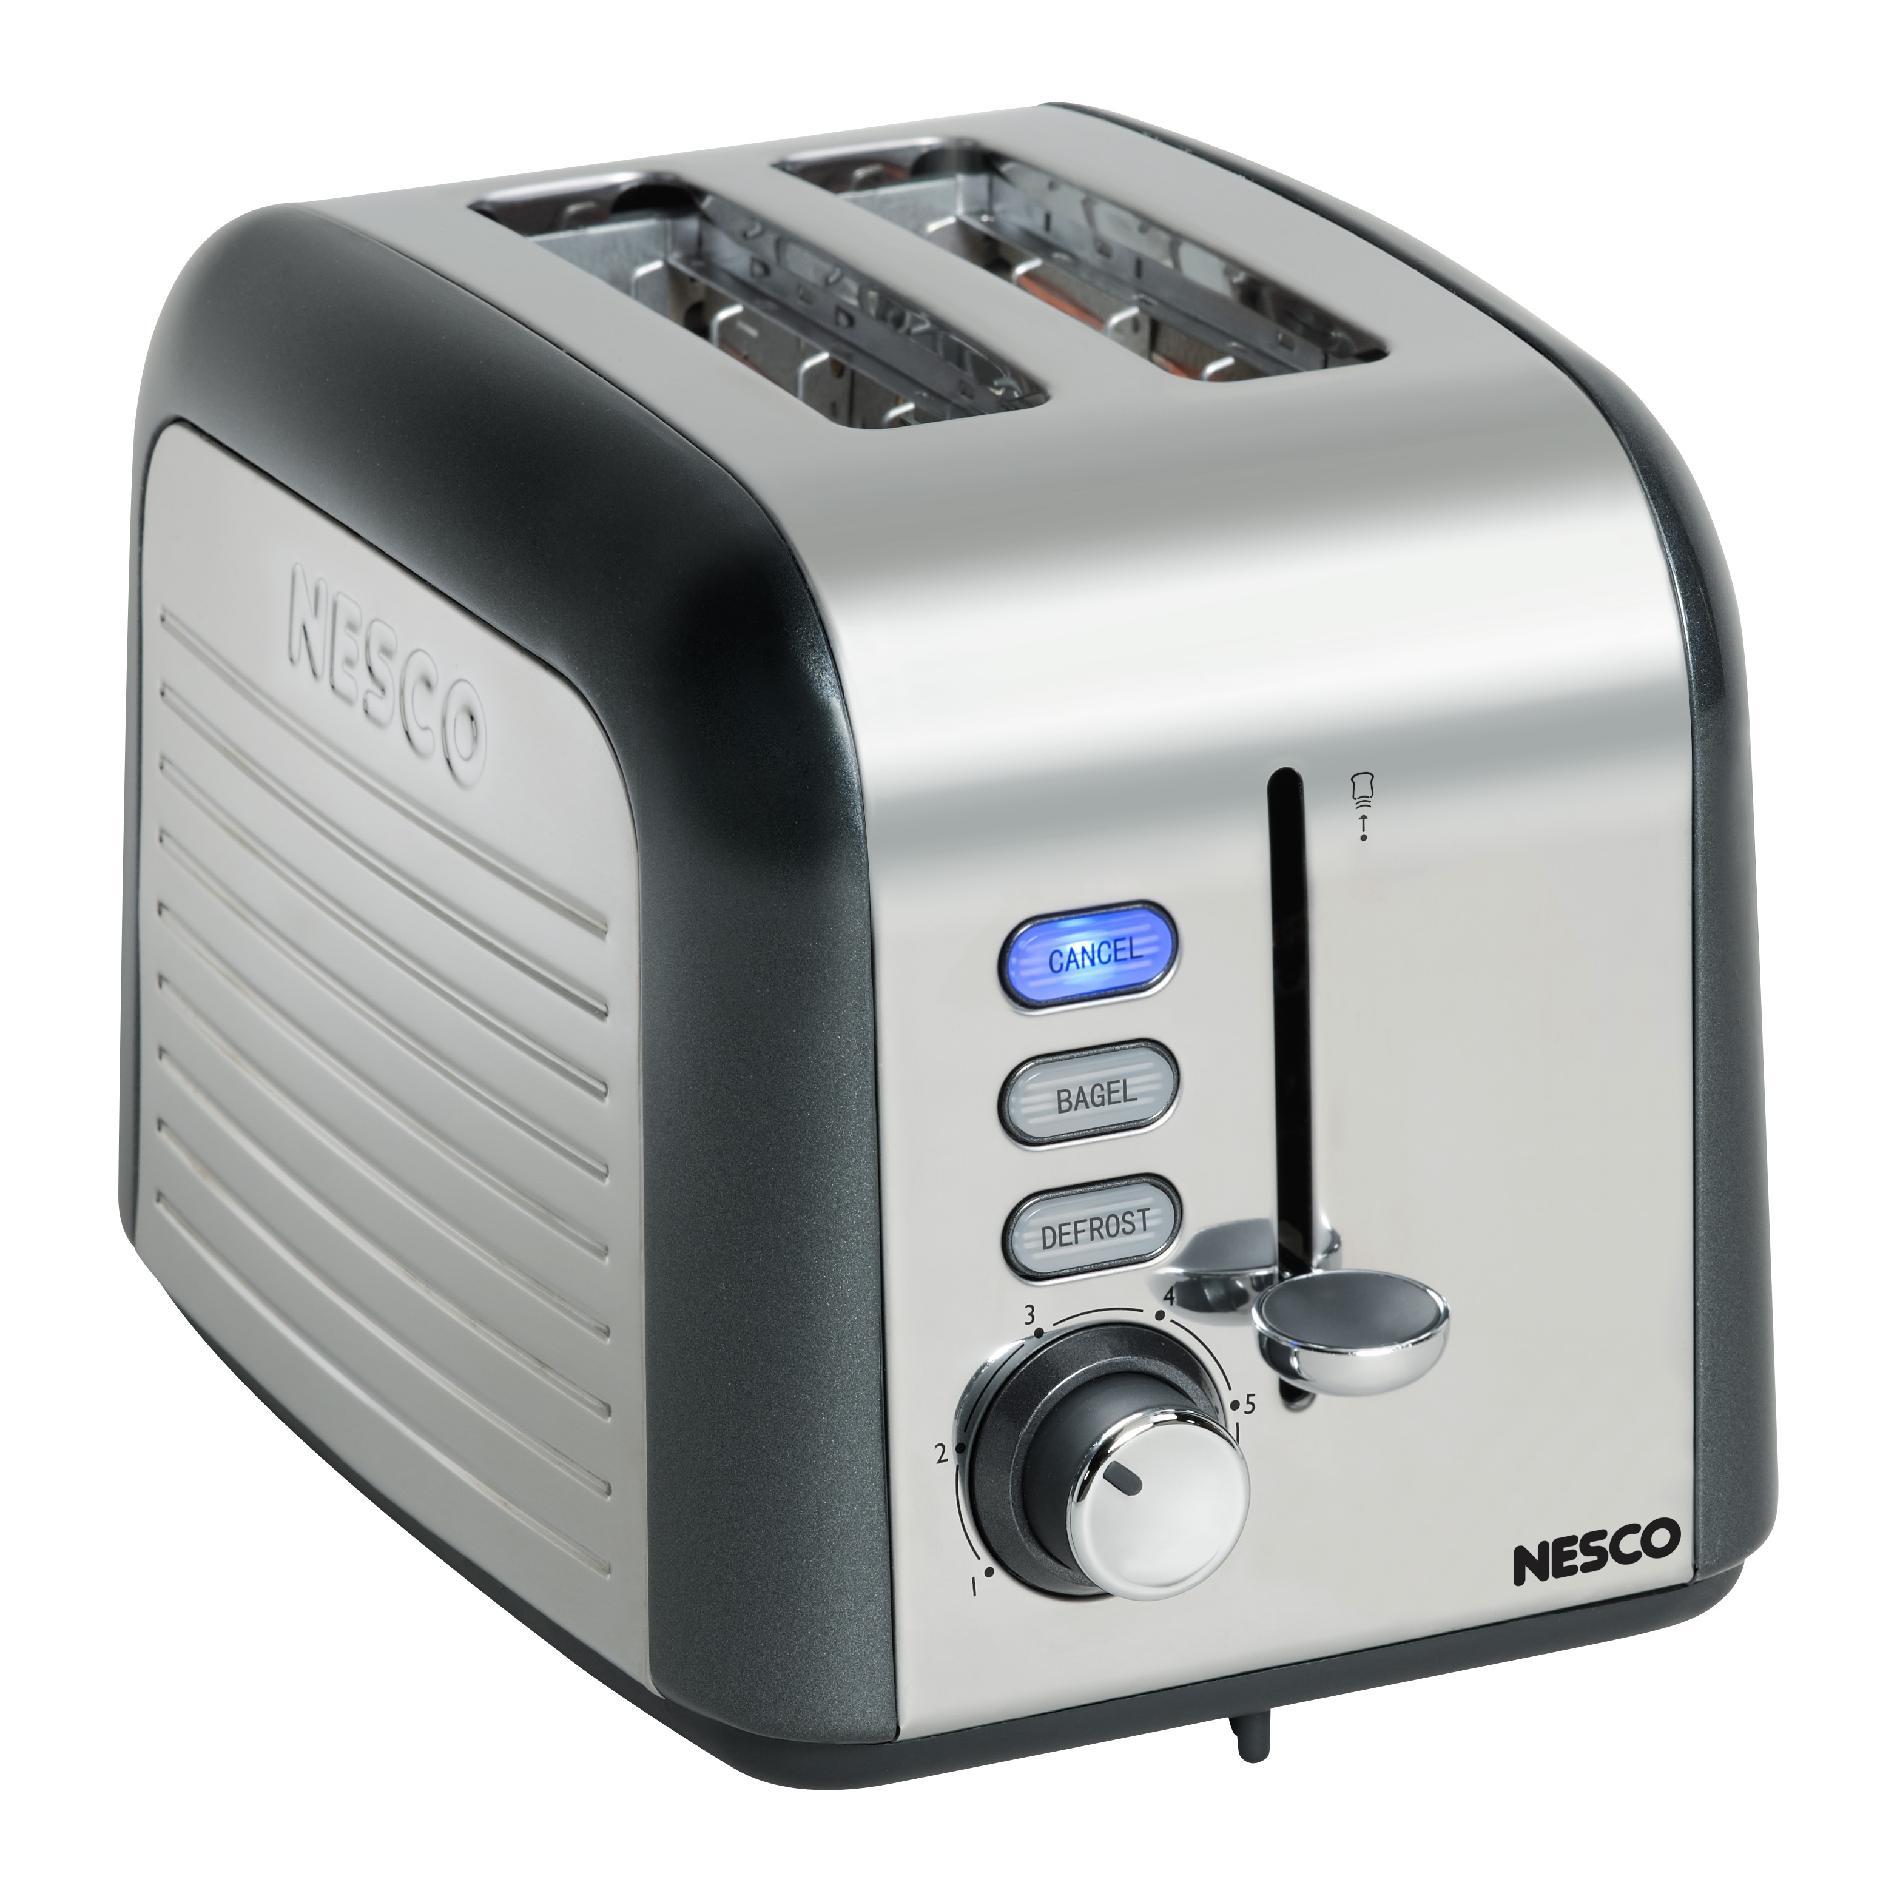 Nesco Gray 2 Slice Toaster